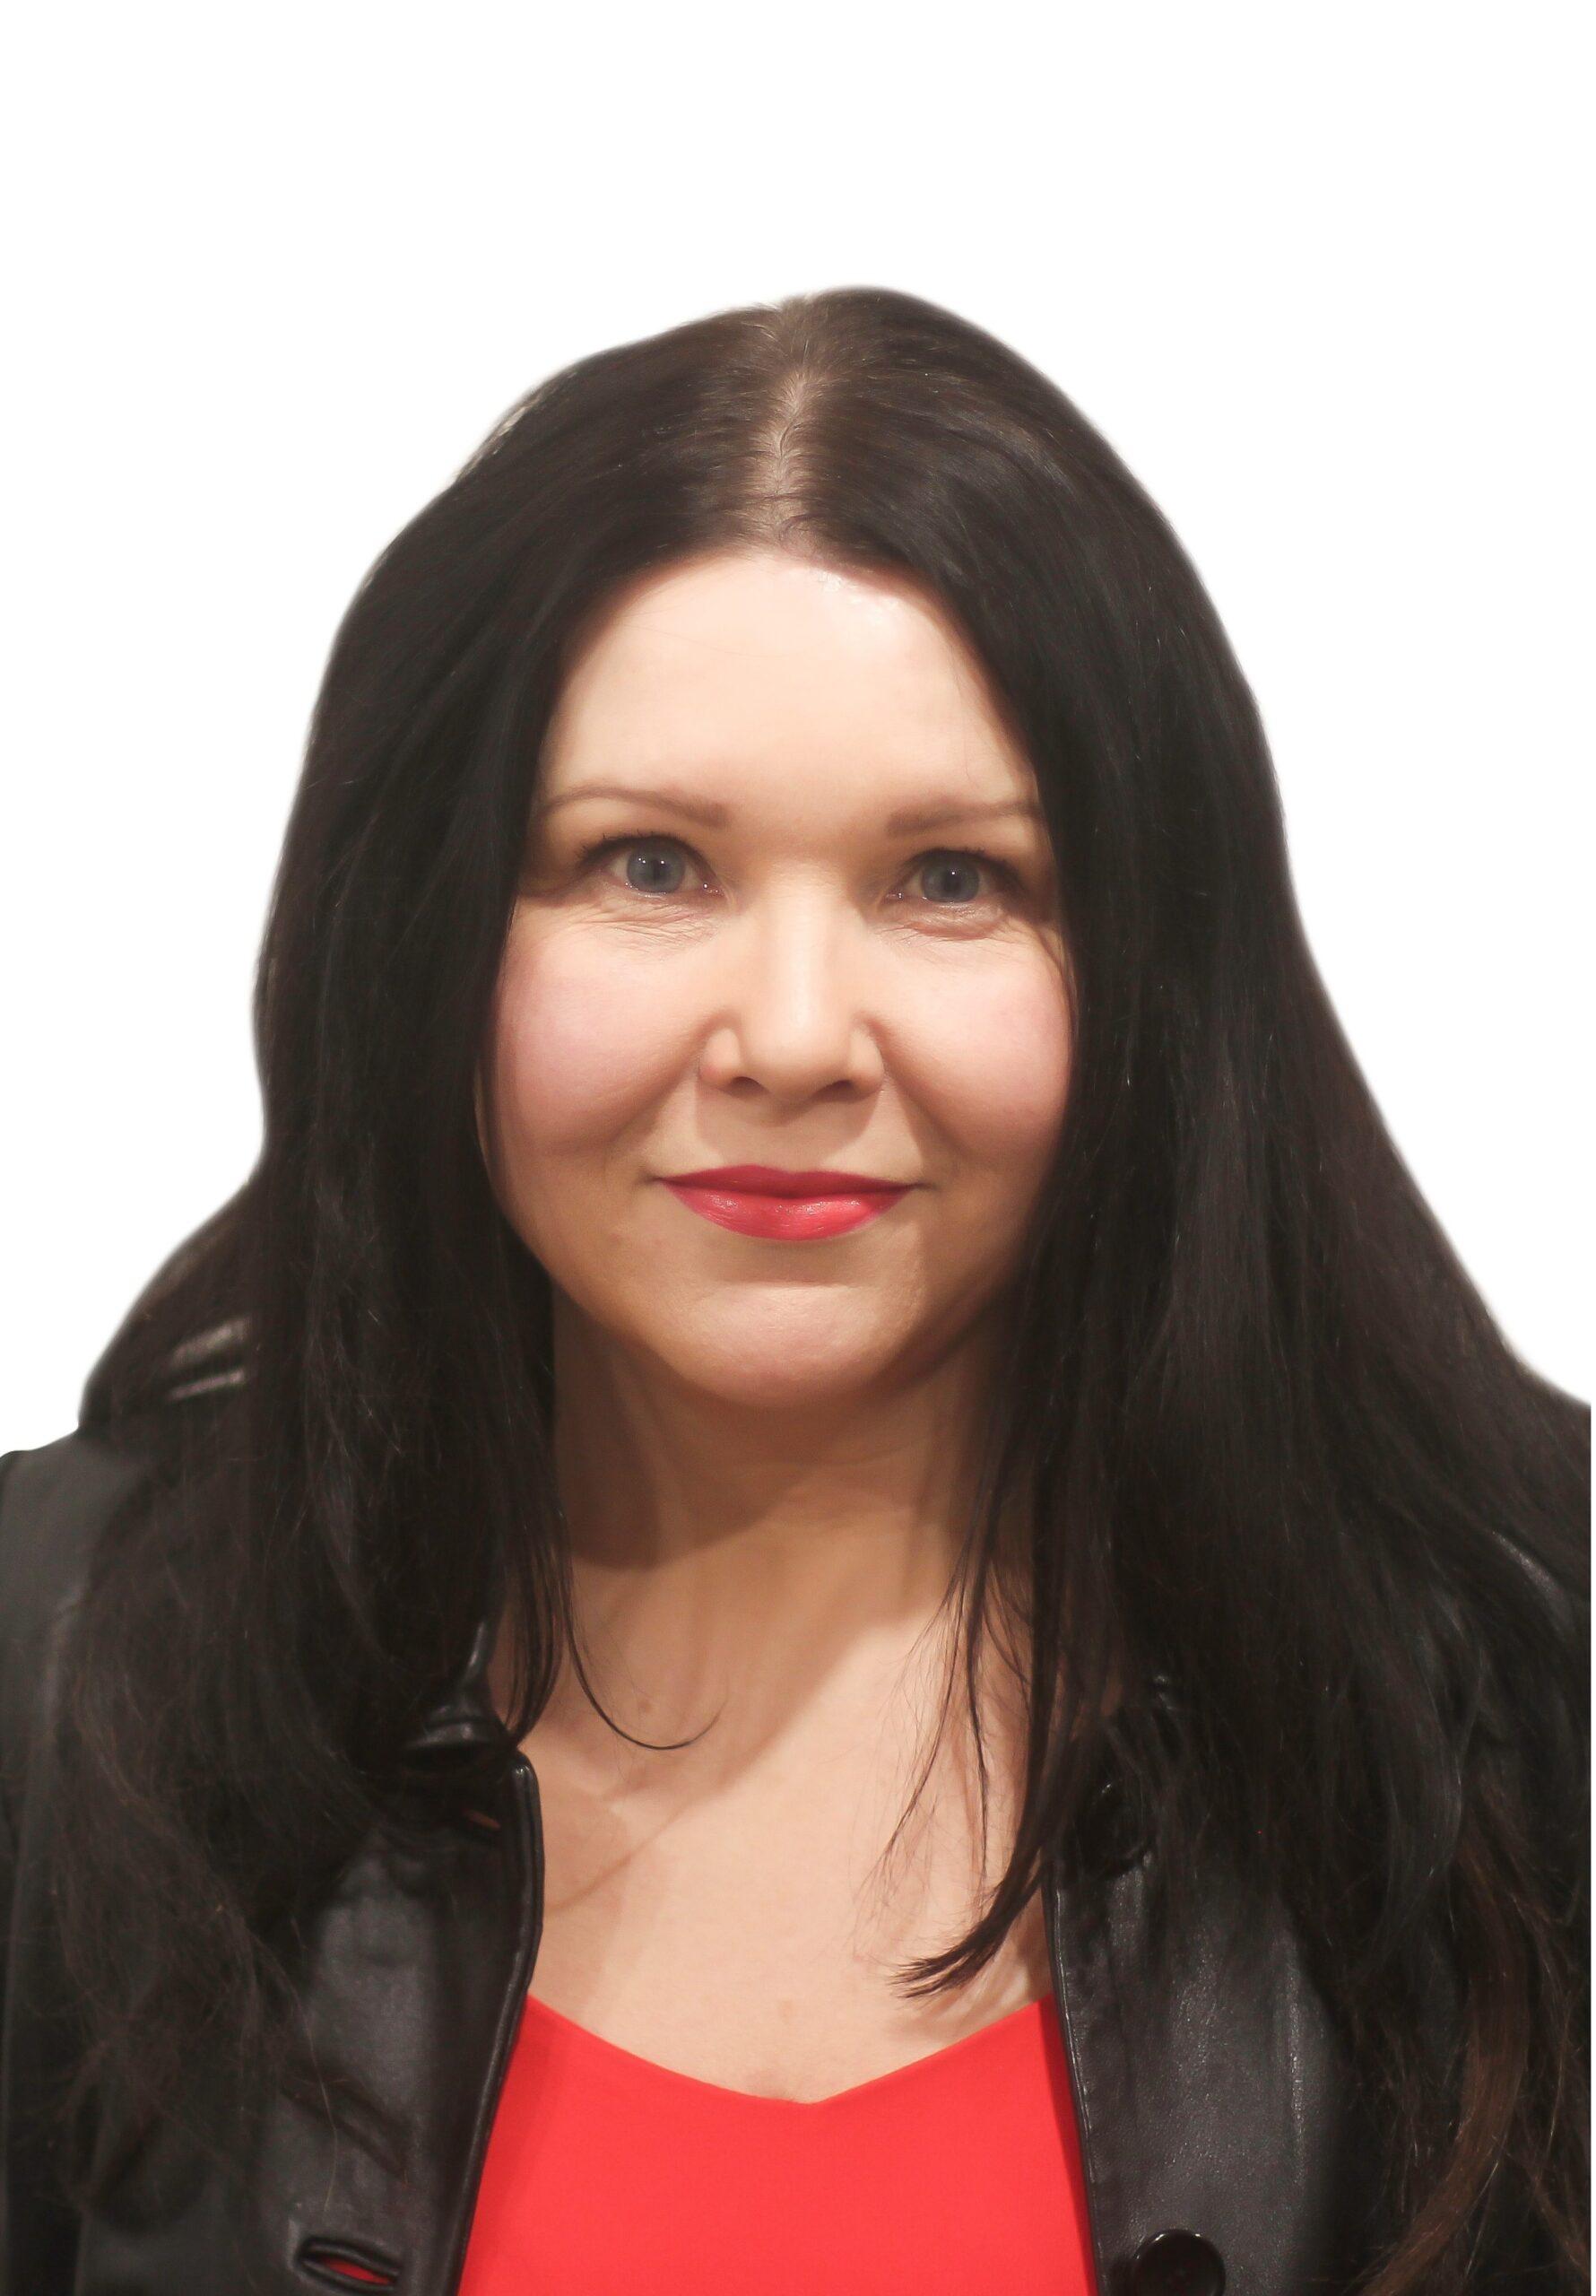 Anne-Maarit Kokko